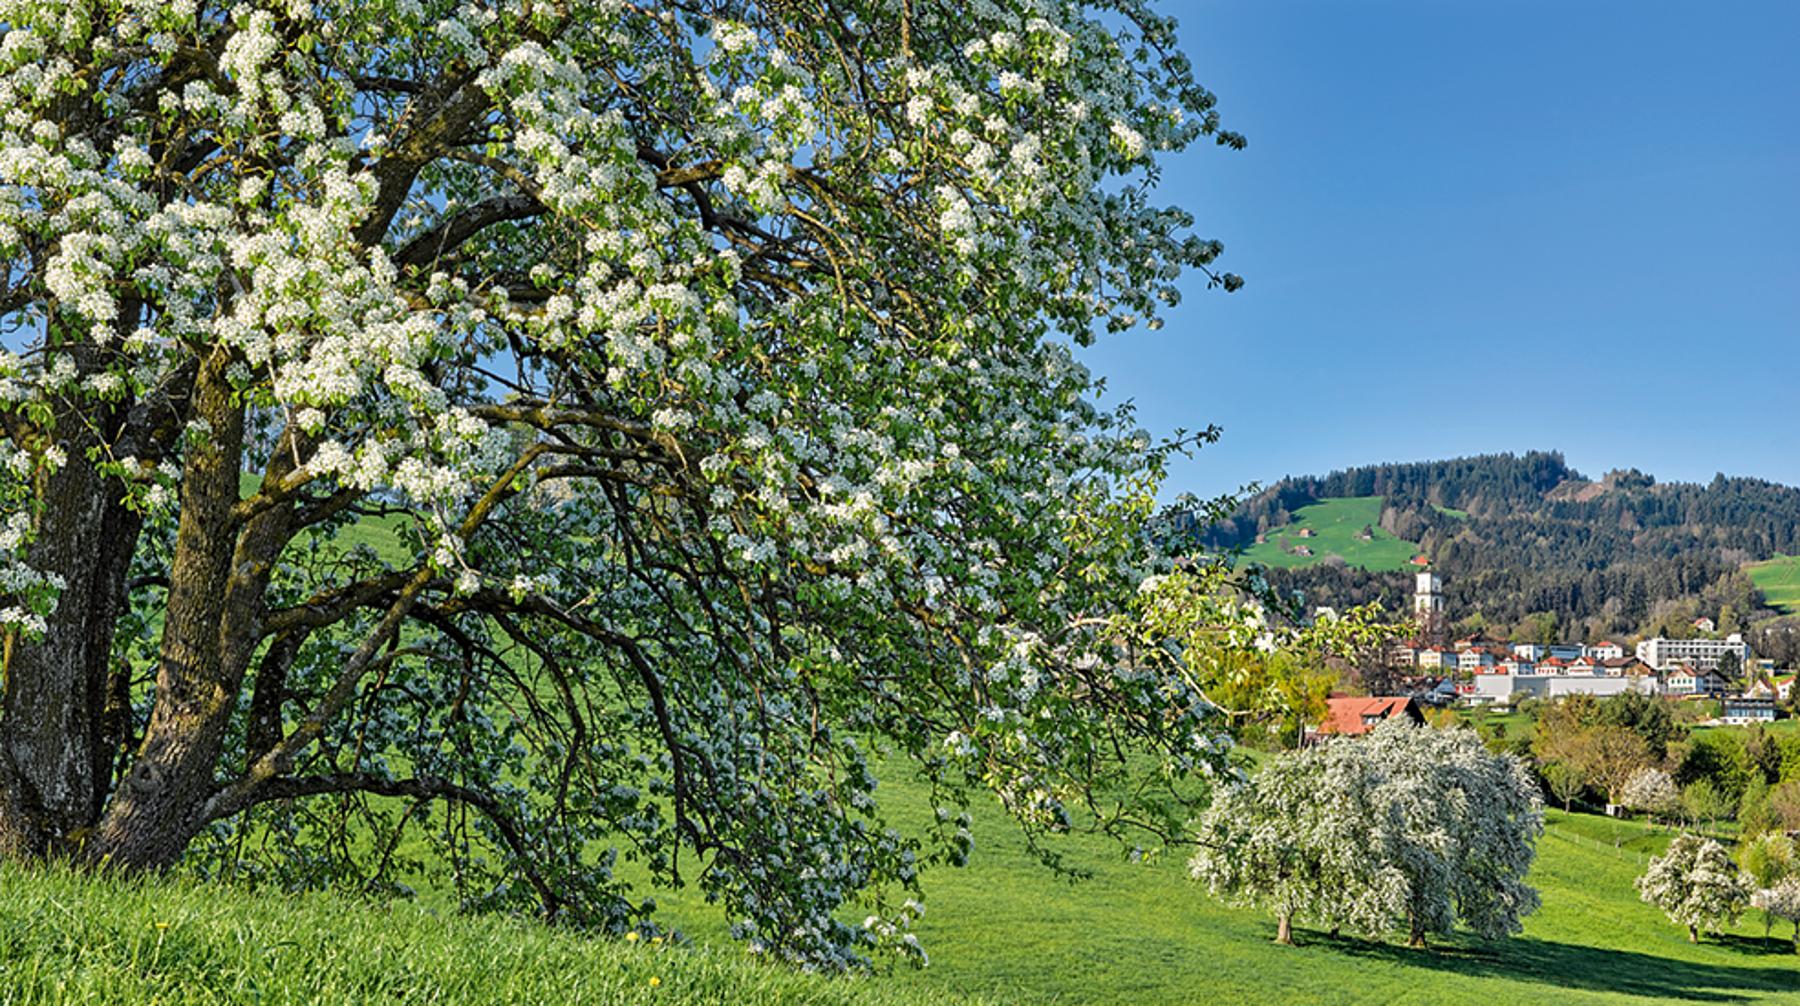 Panorama Appenzellerland 2019 April